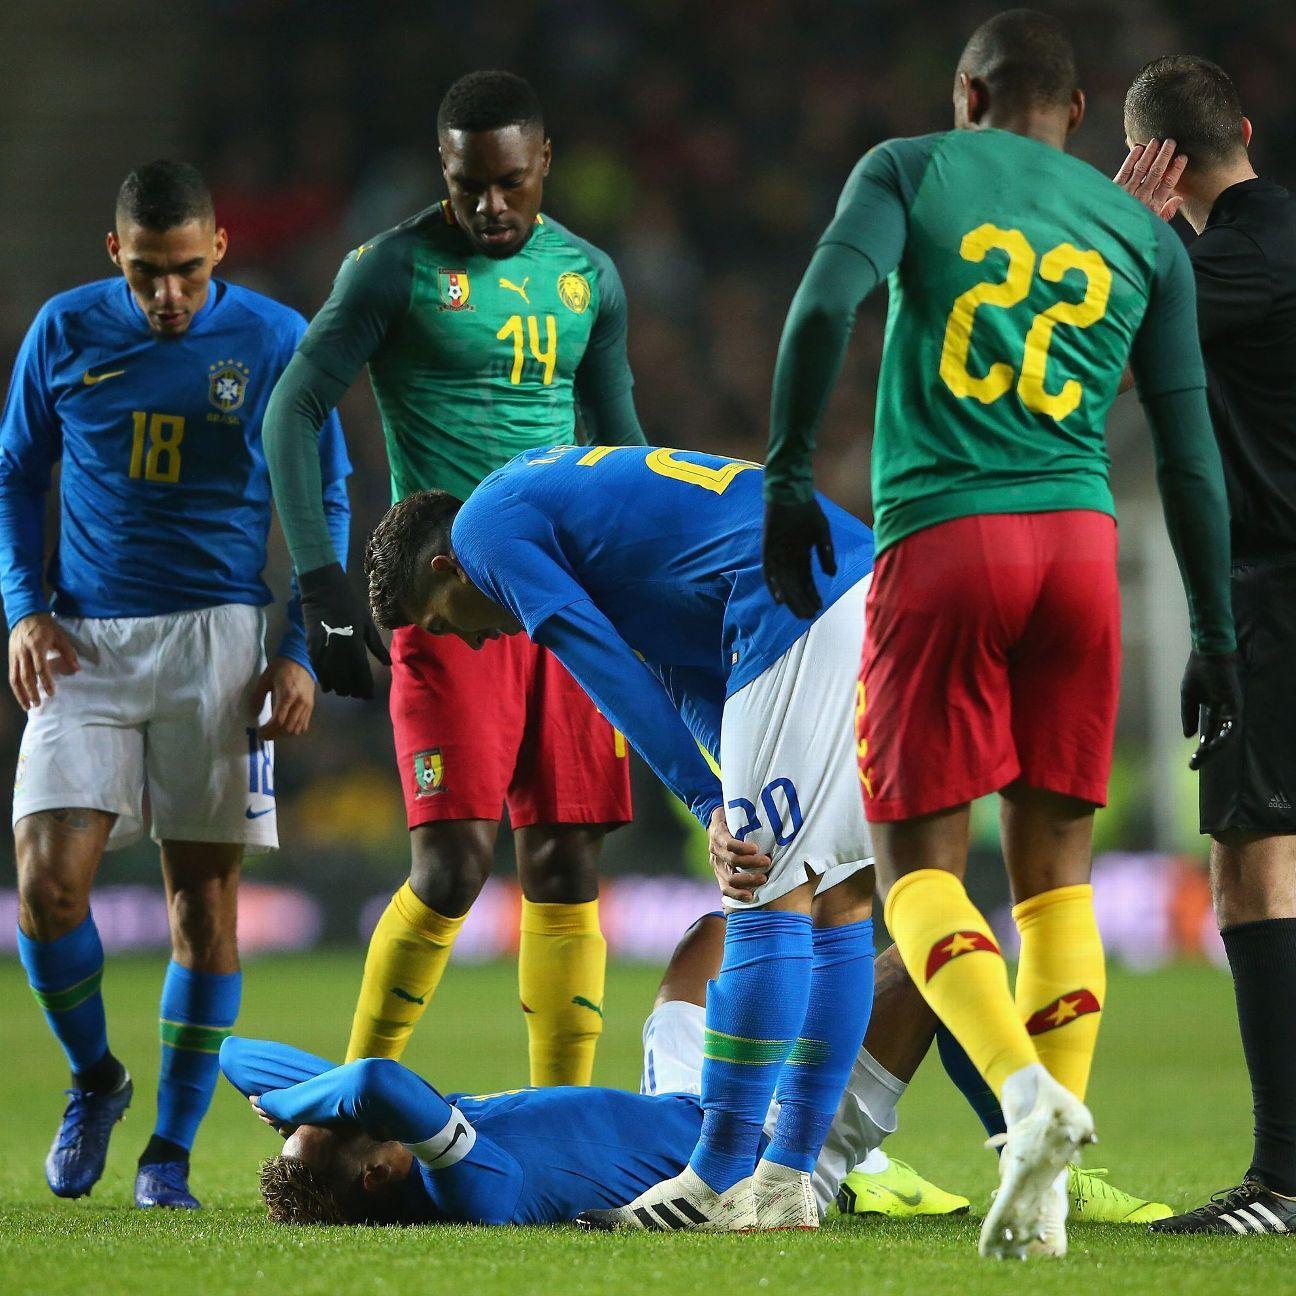 PSG stars Neymar, Kylian Mbappe forced off injured during international friendlies